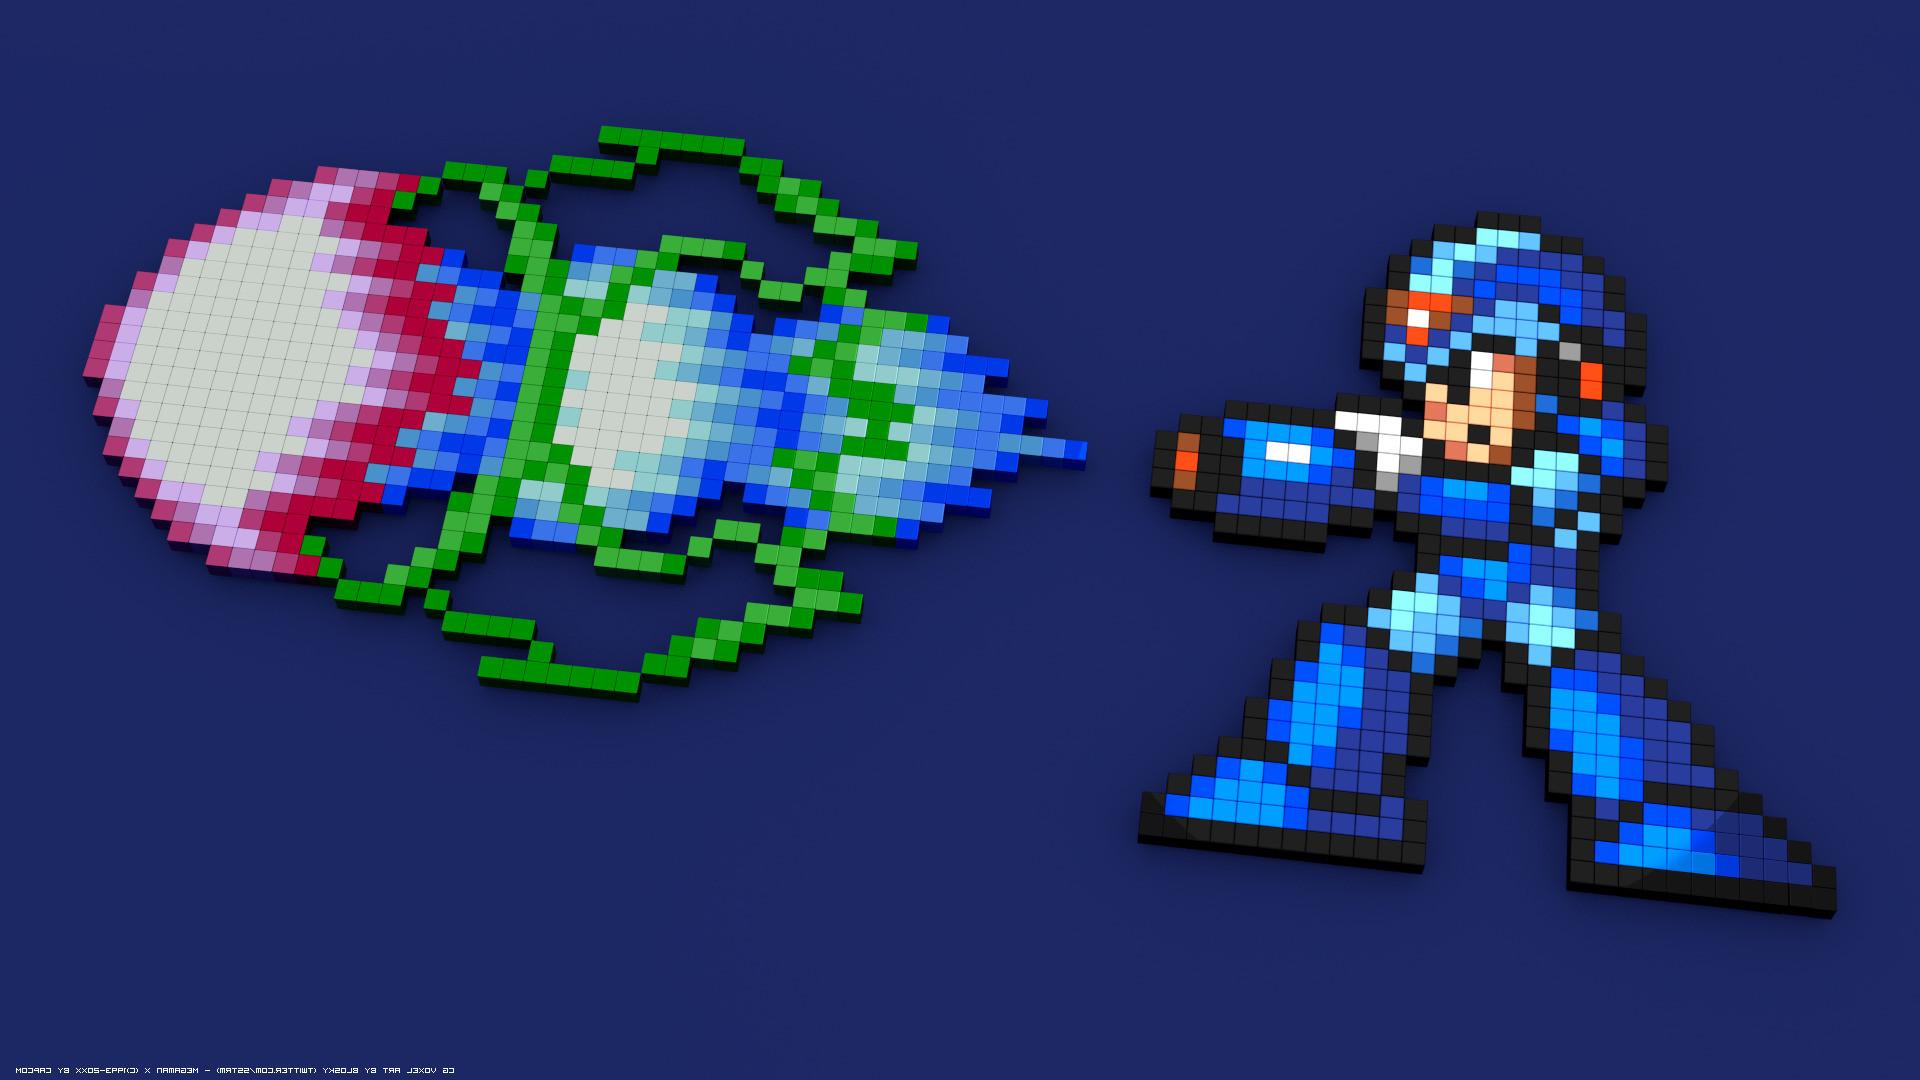 Megaman X, 16 bit, 8 bit, Pixelated, Pixel Art, 3D Blocks, 3D, Video Games  Wallpapers HD / Desktop and Mobile Backgrounds